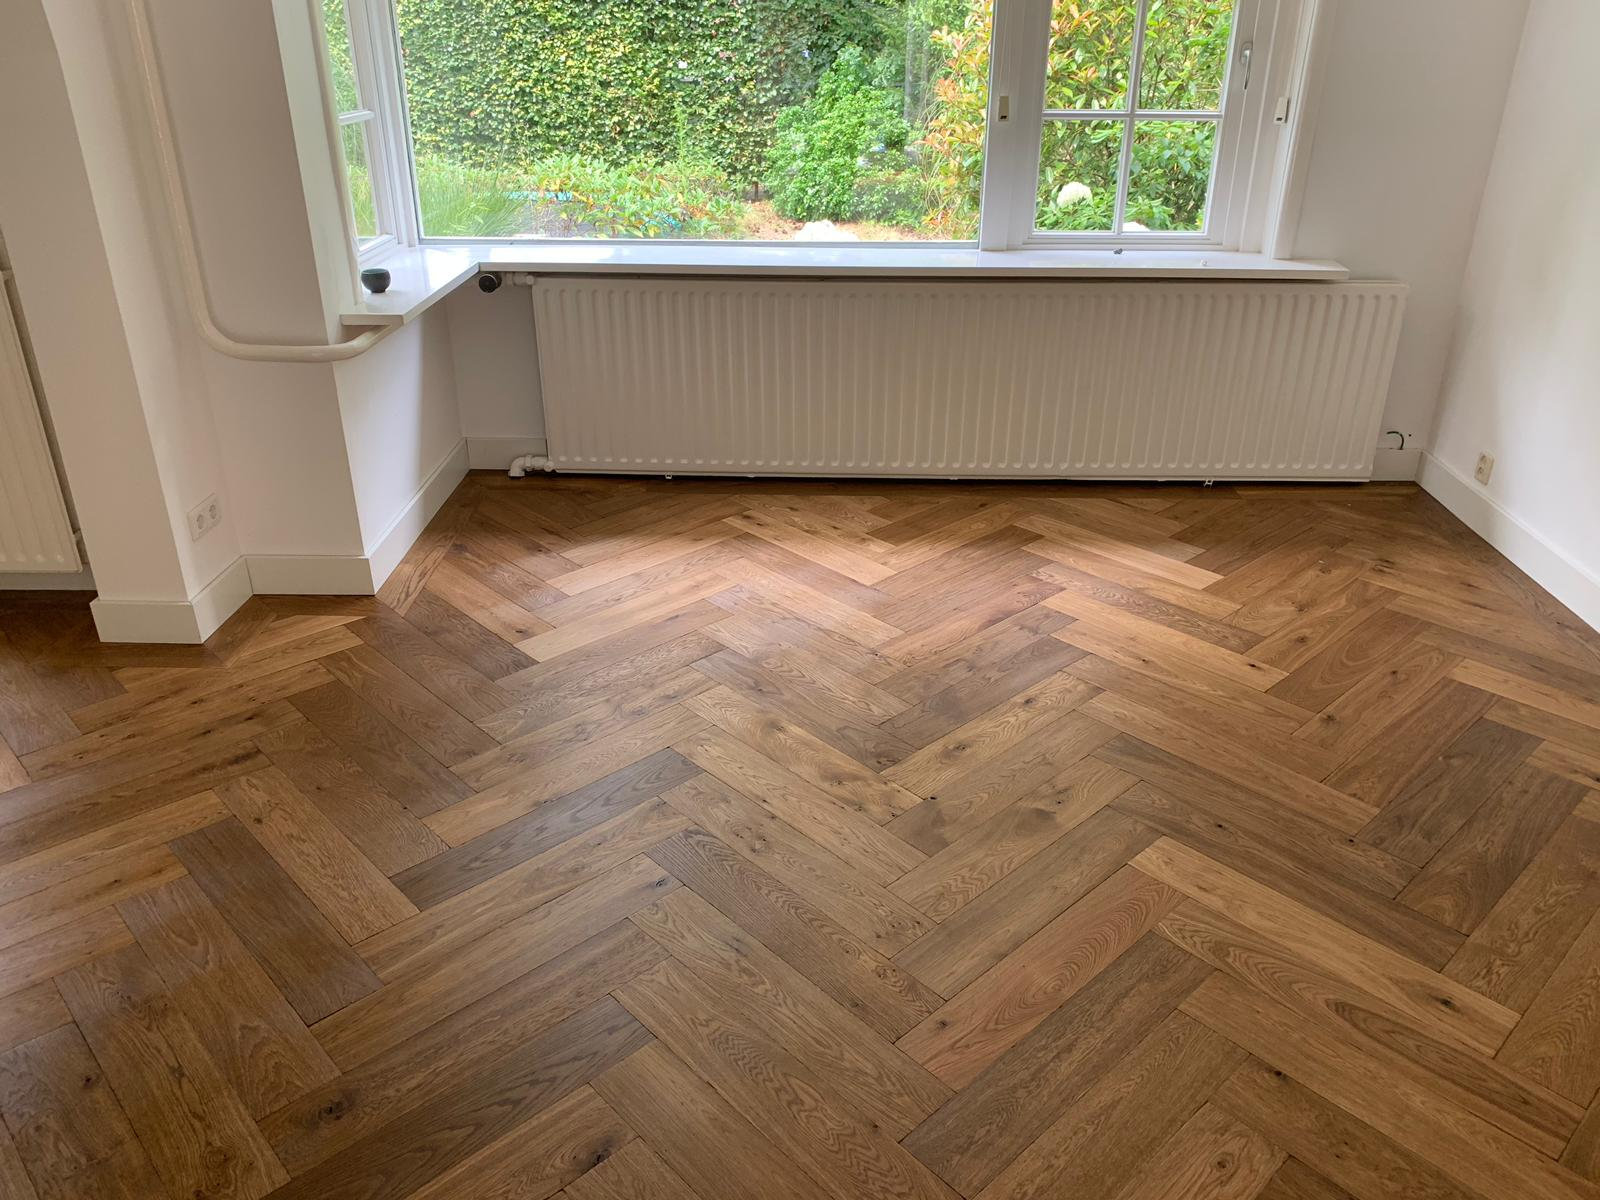 gerookte houten visgraat vloer